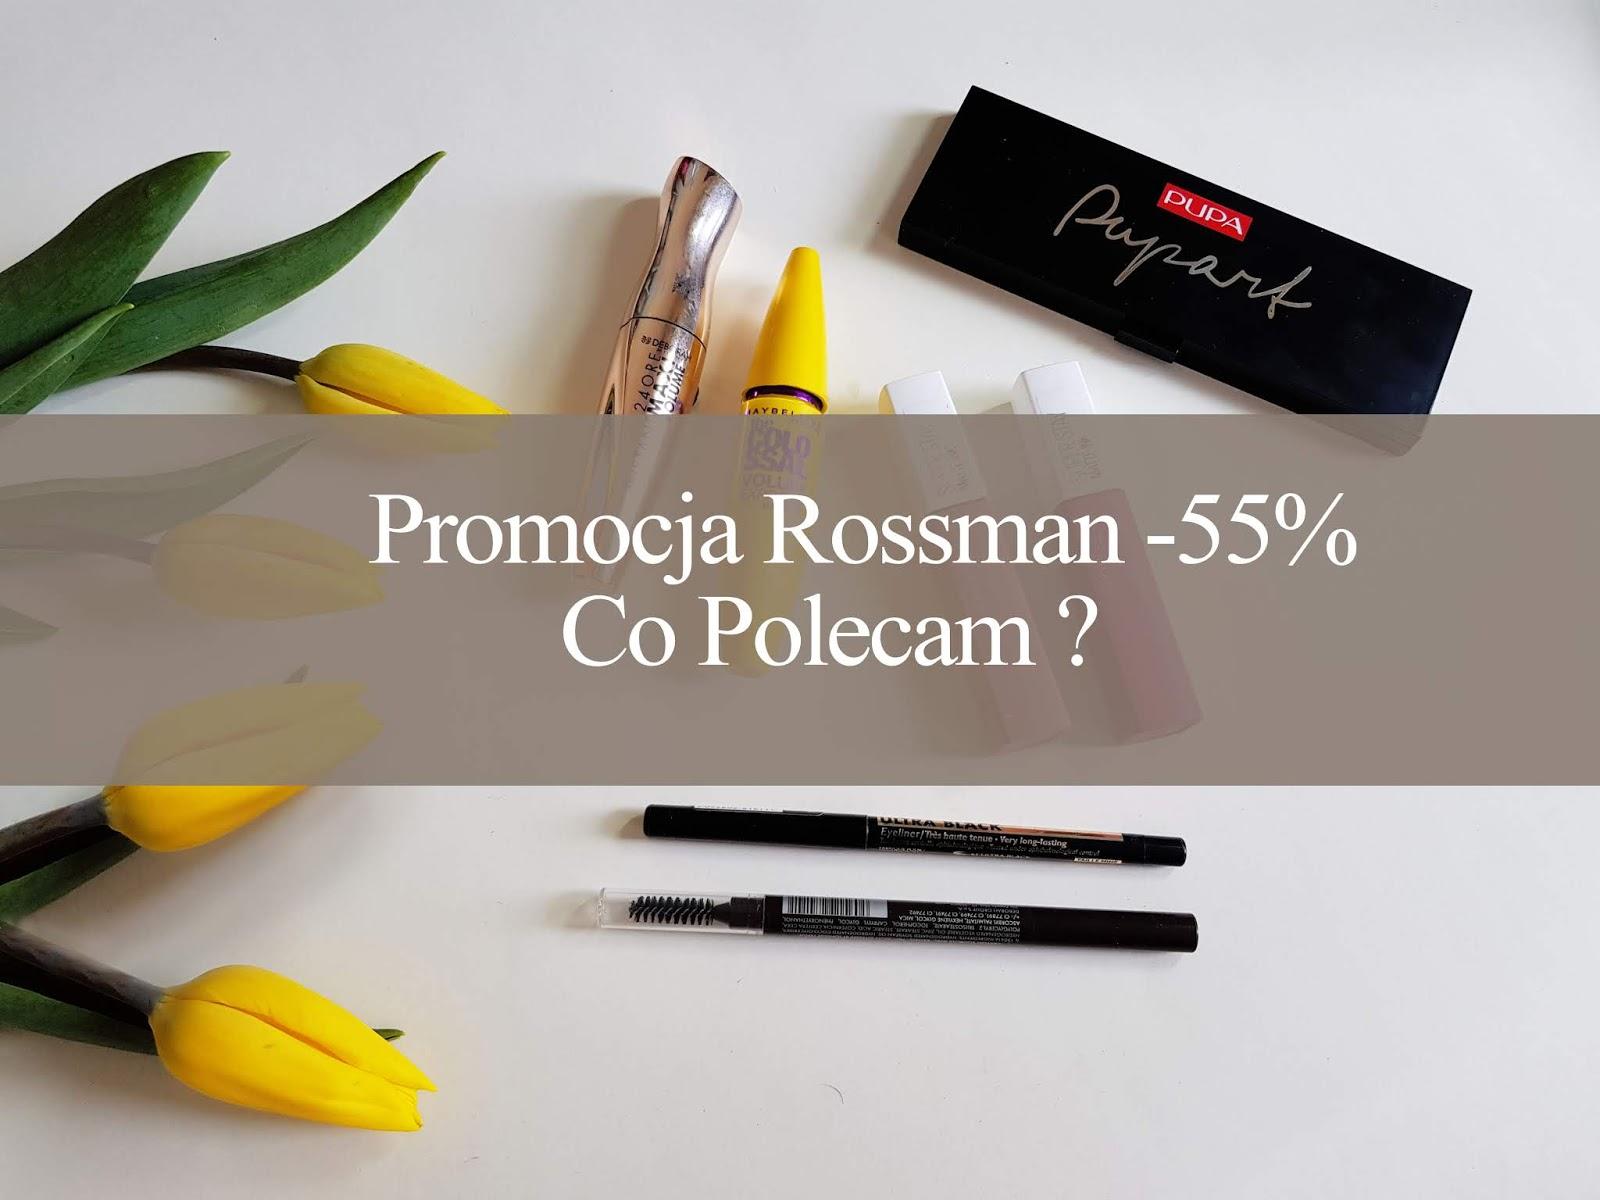 Promocja Rossman -55% - Co polecam ?